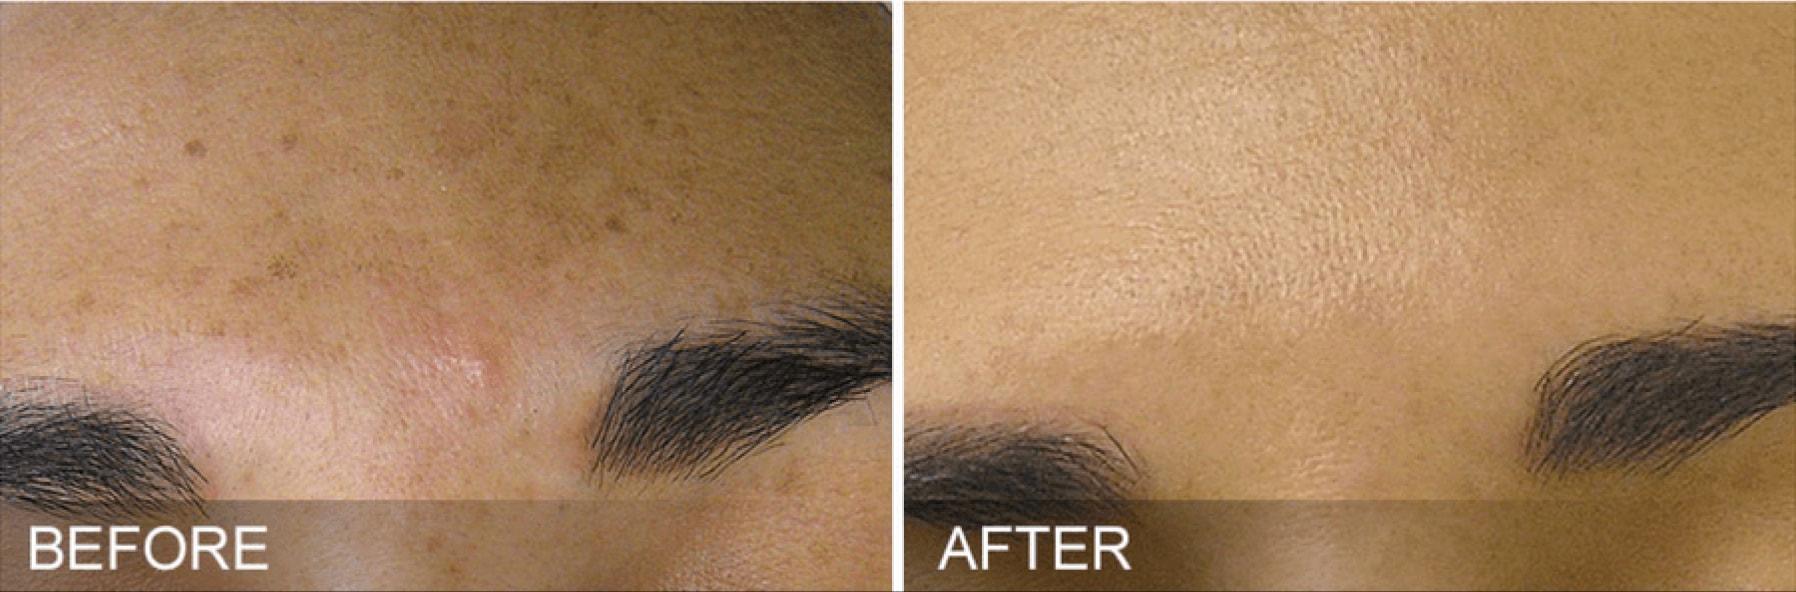 HydraFacial clear skin